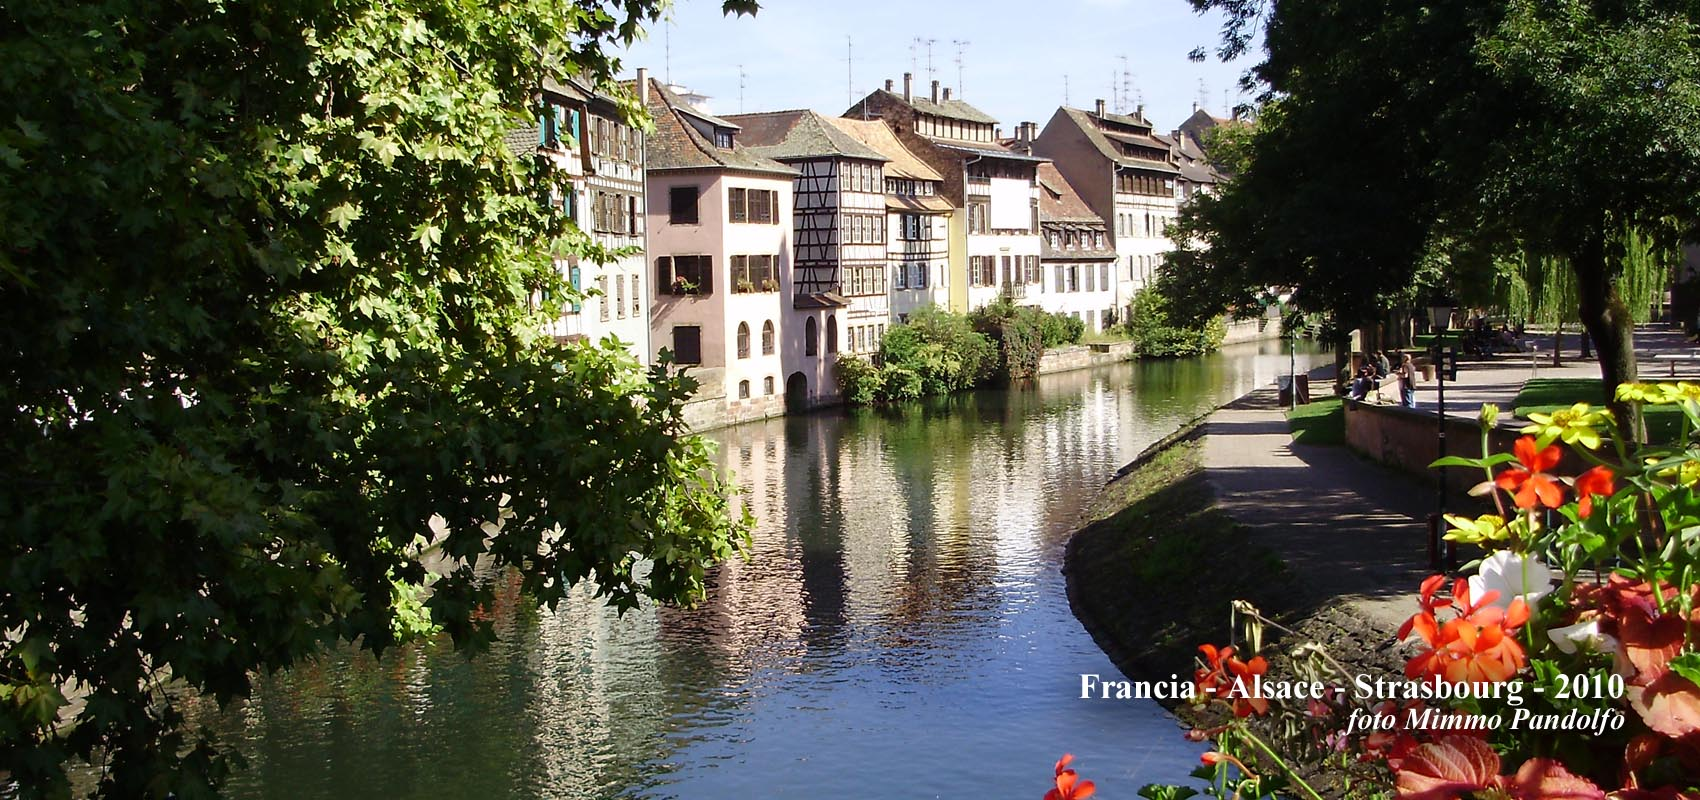 Francia, Alsace - Strasbourg - 2015